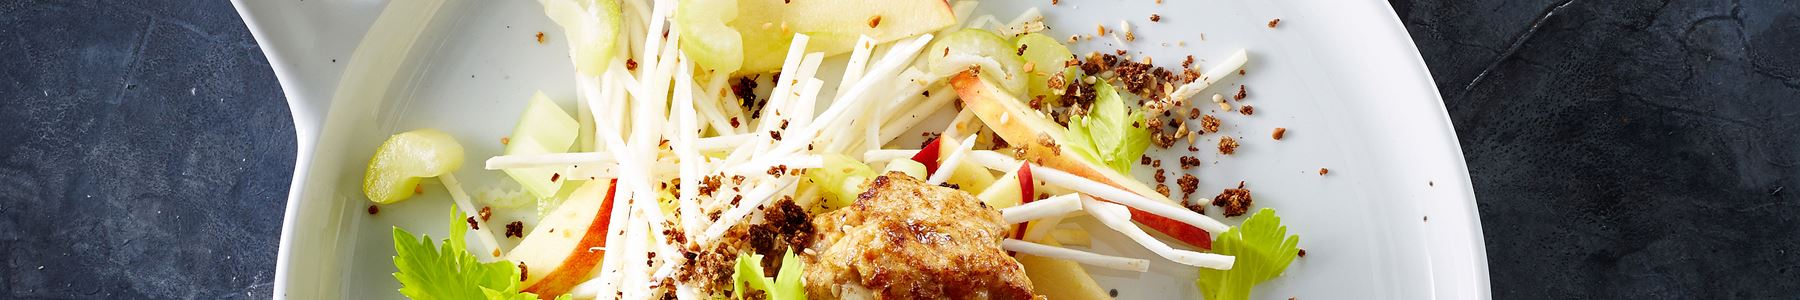 Salater + Havregryn + Efterår